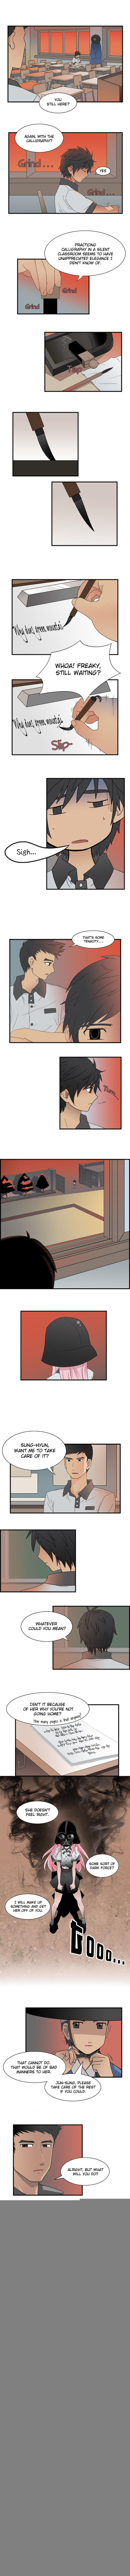 Galactic Romance 4 Page 2